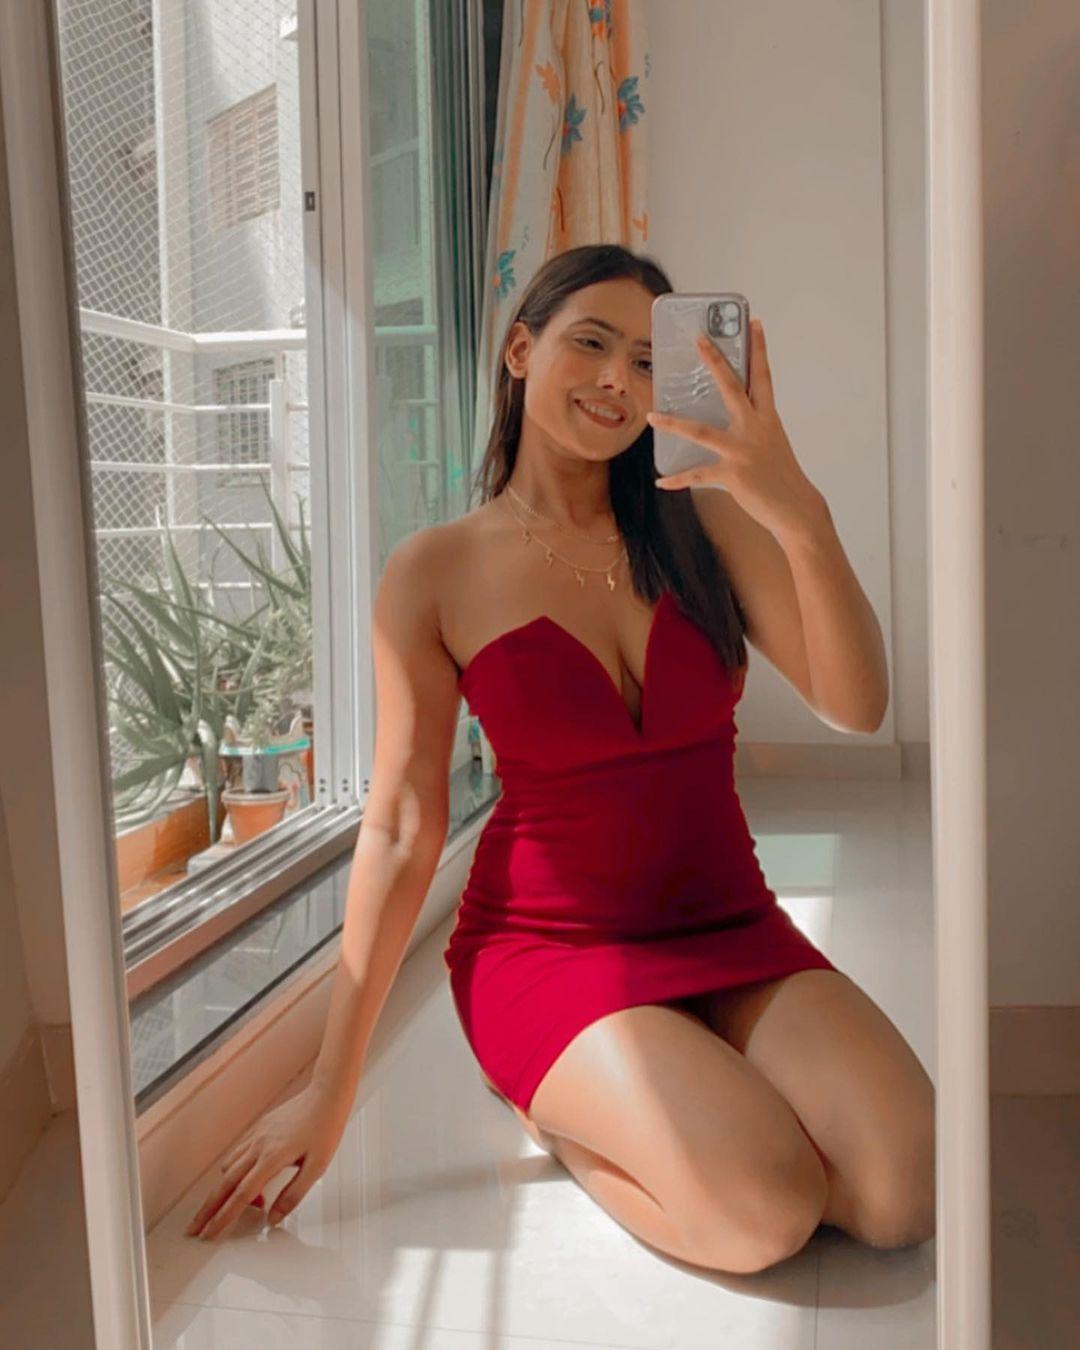 Mirror Selfie Pose For Girl